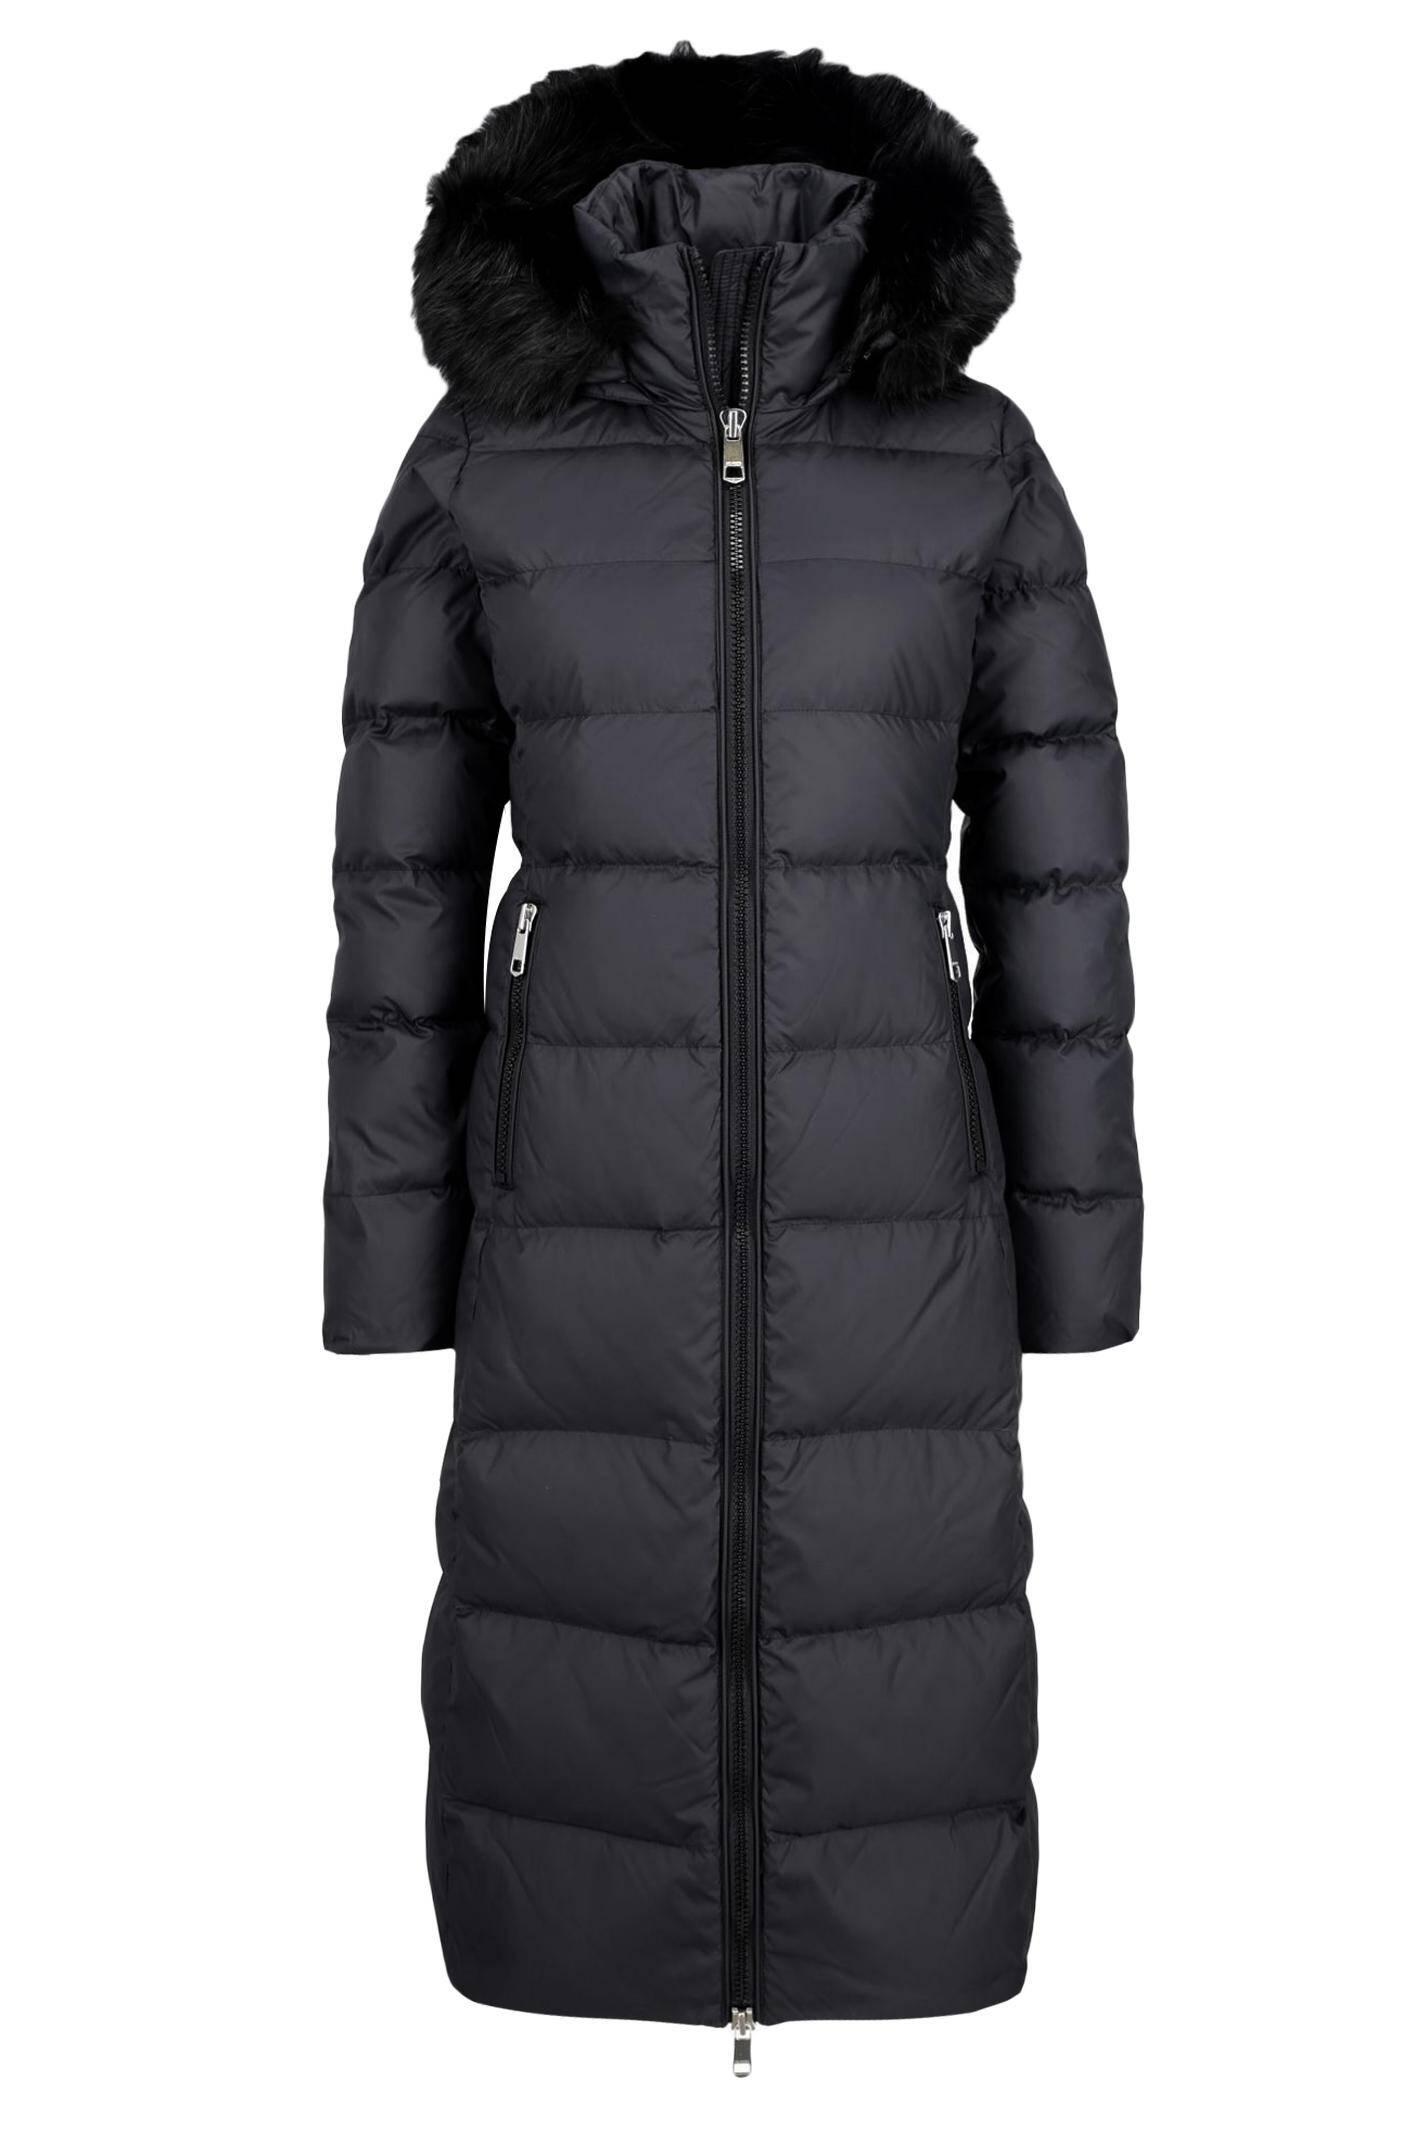 Coat Tommy Hilfiger   Black   Gomez.pl en e15a6a149d